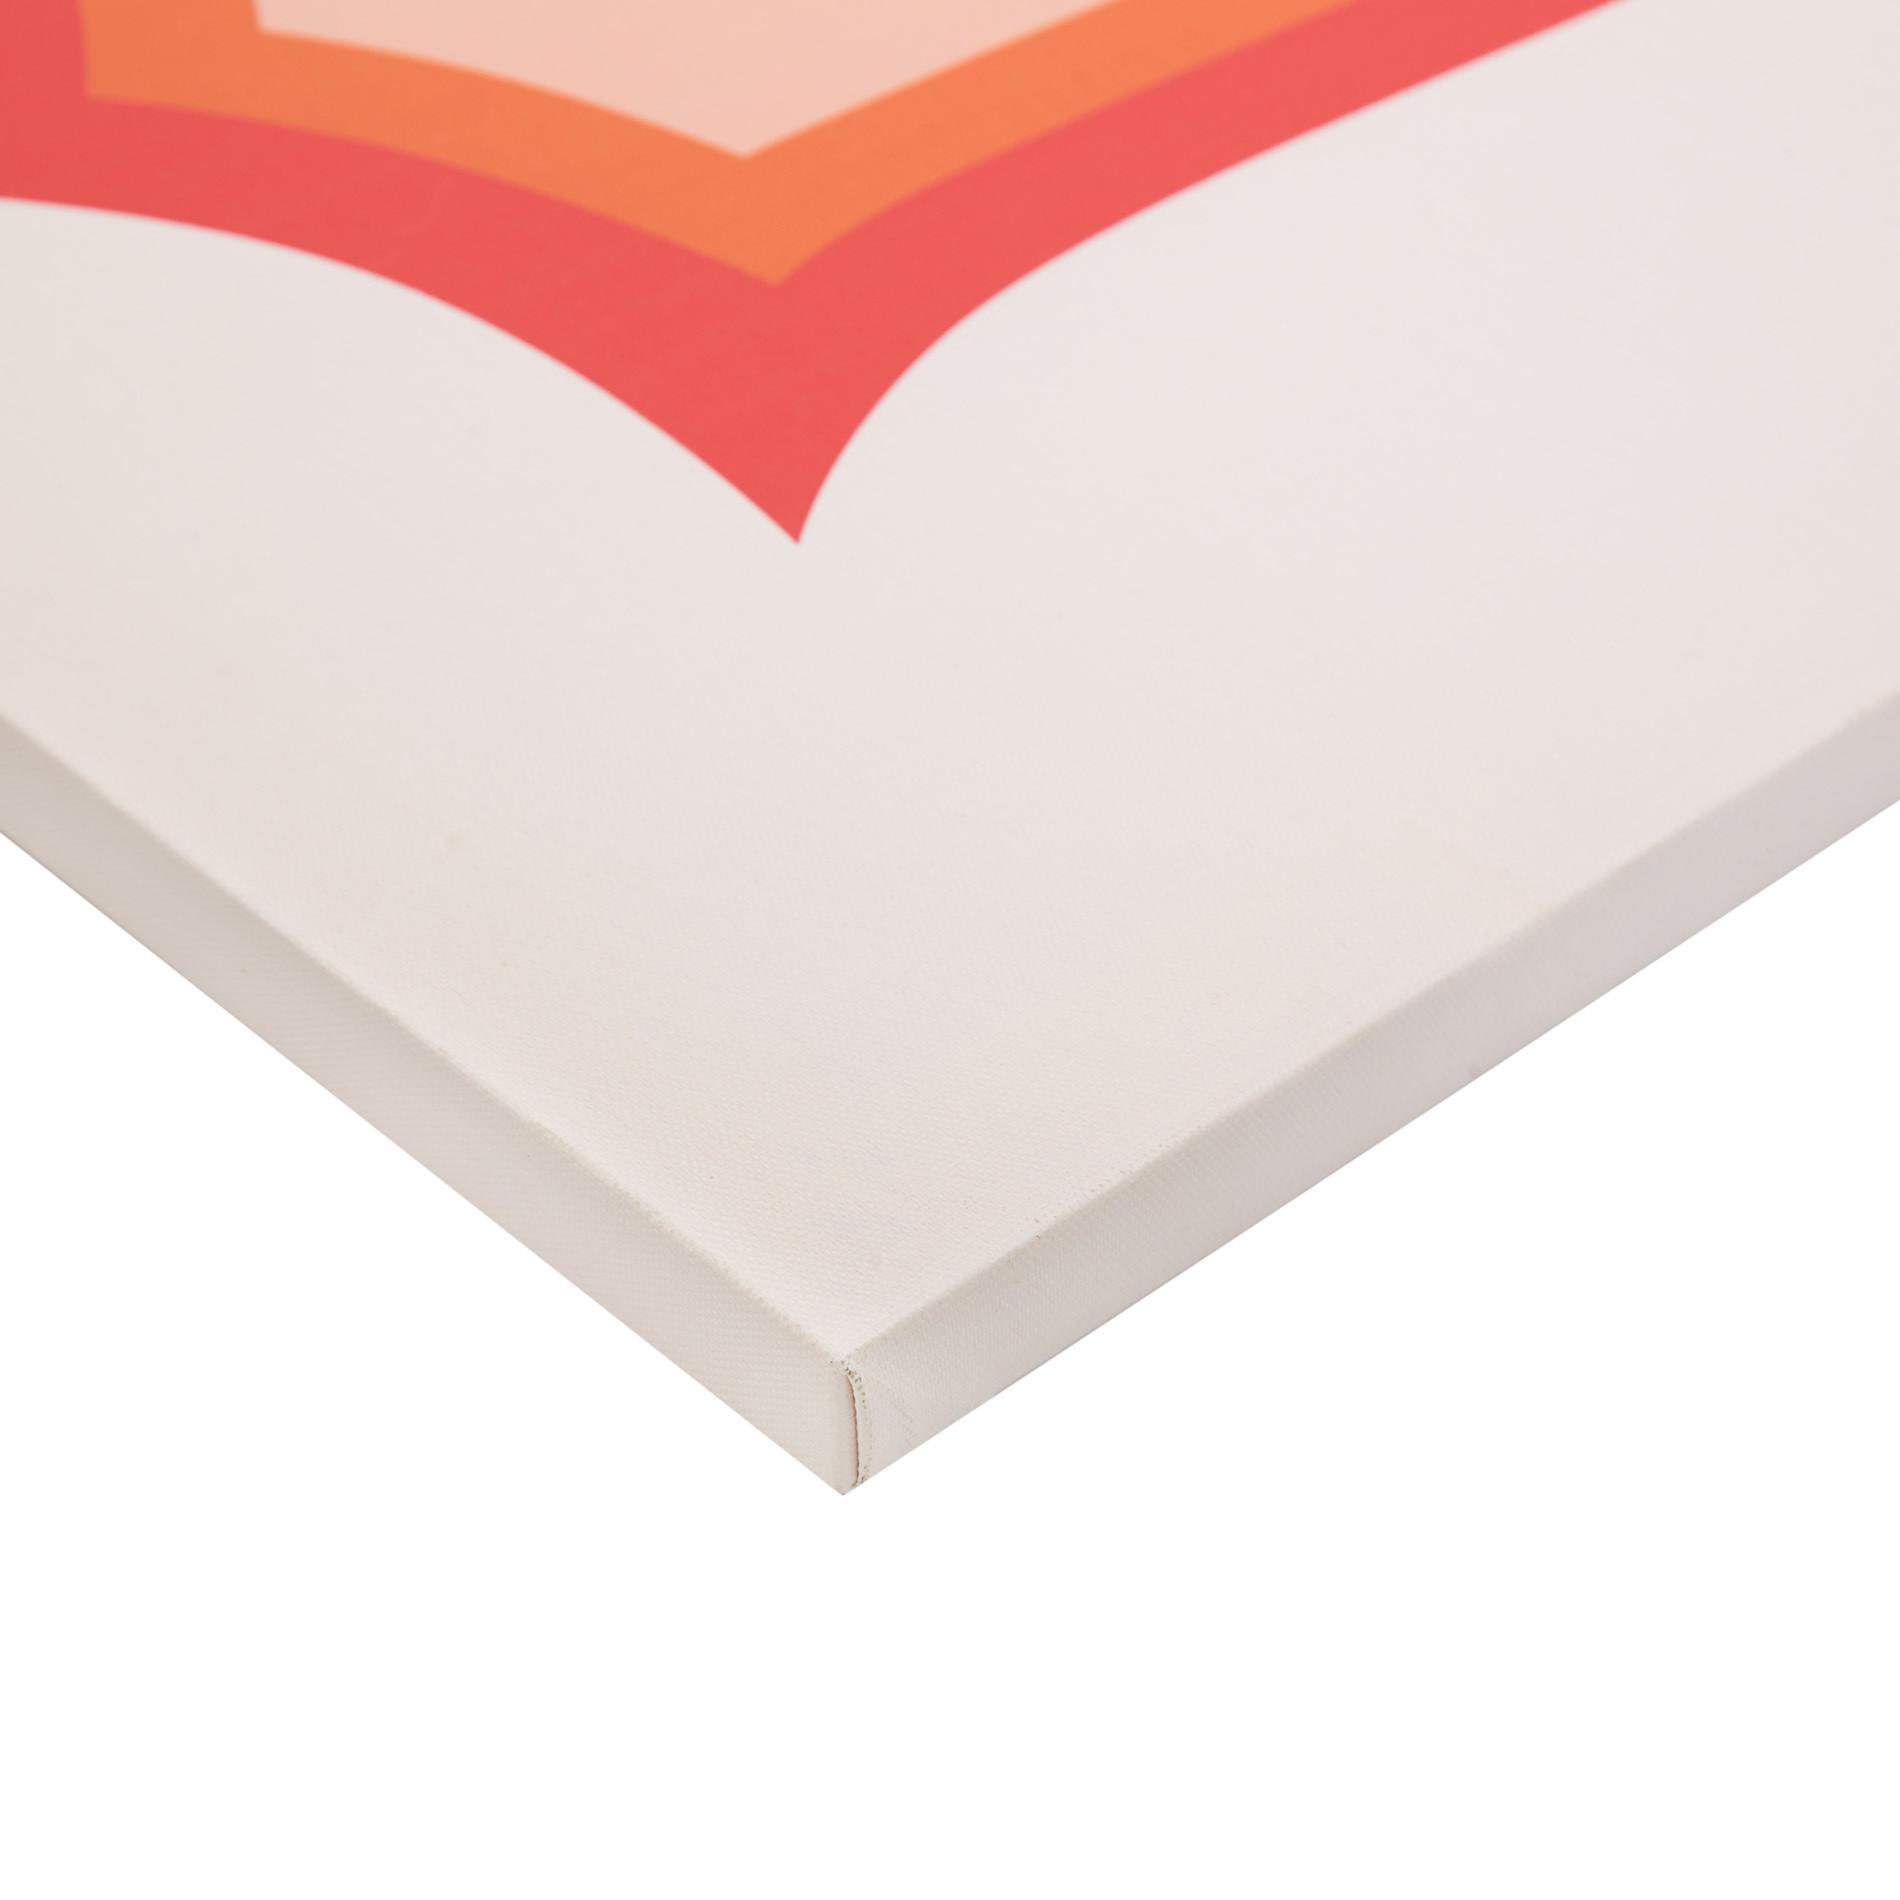 Tela con stampa fotografica occhiali, Arancione, large image number 1